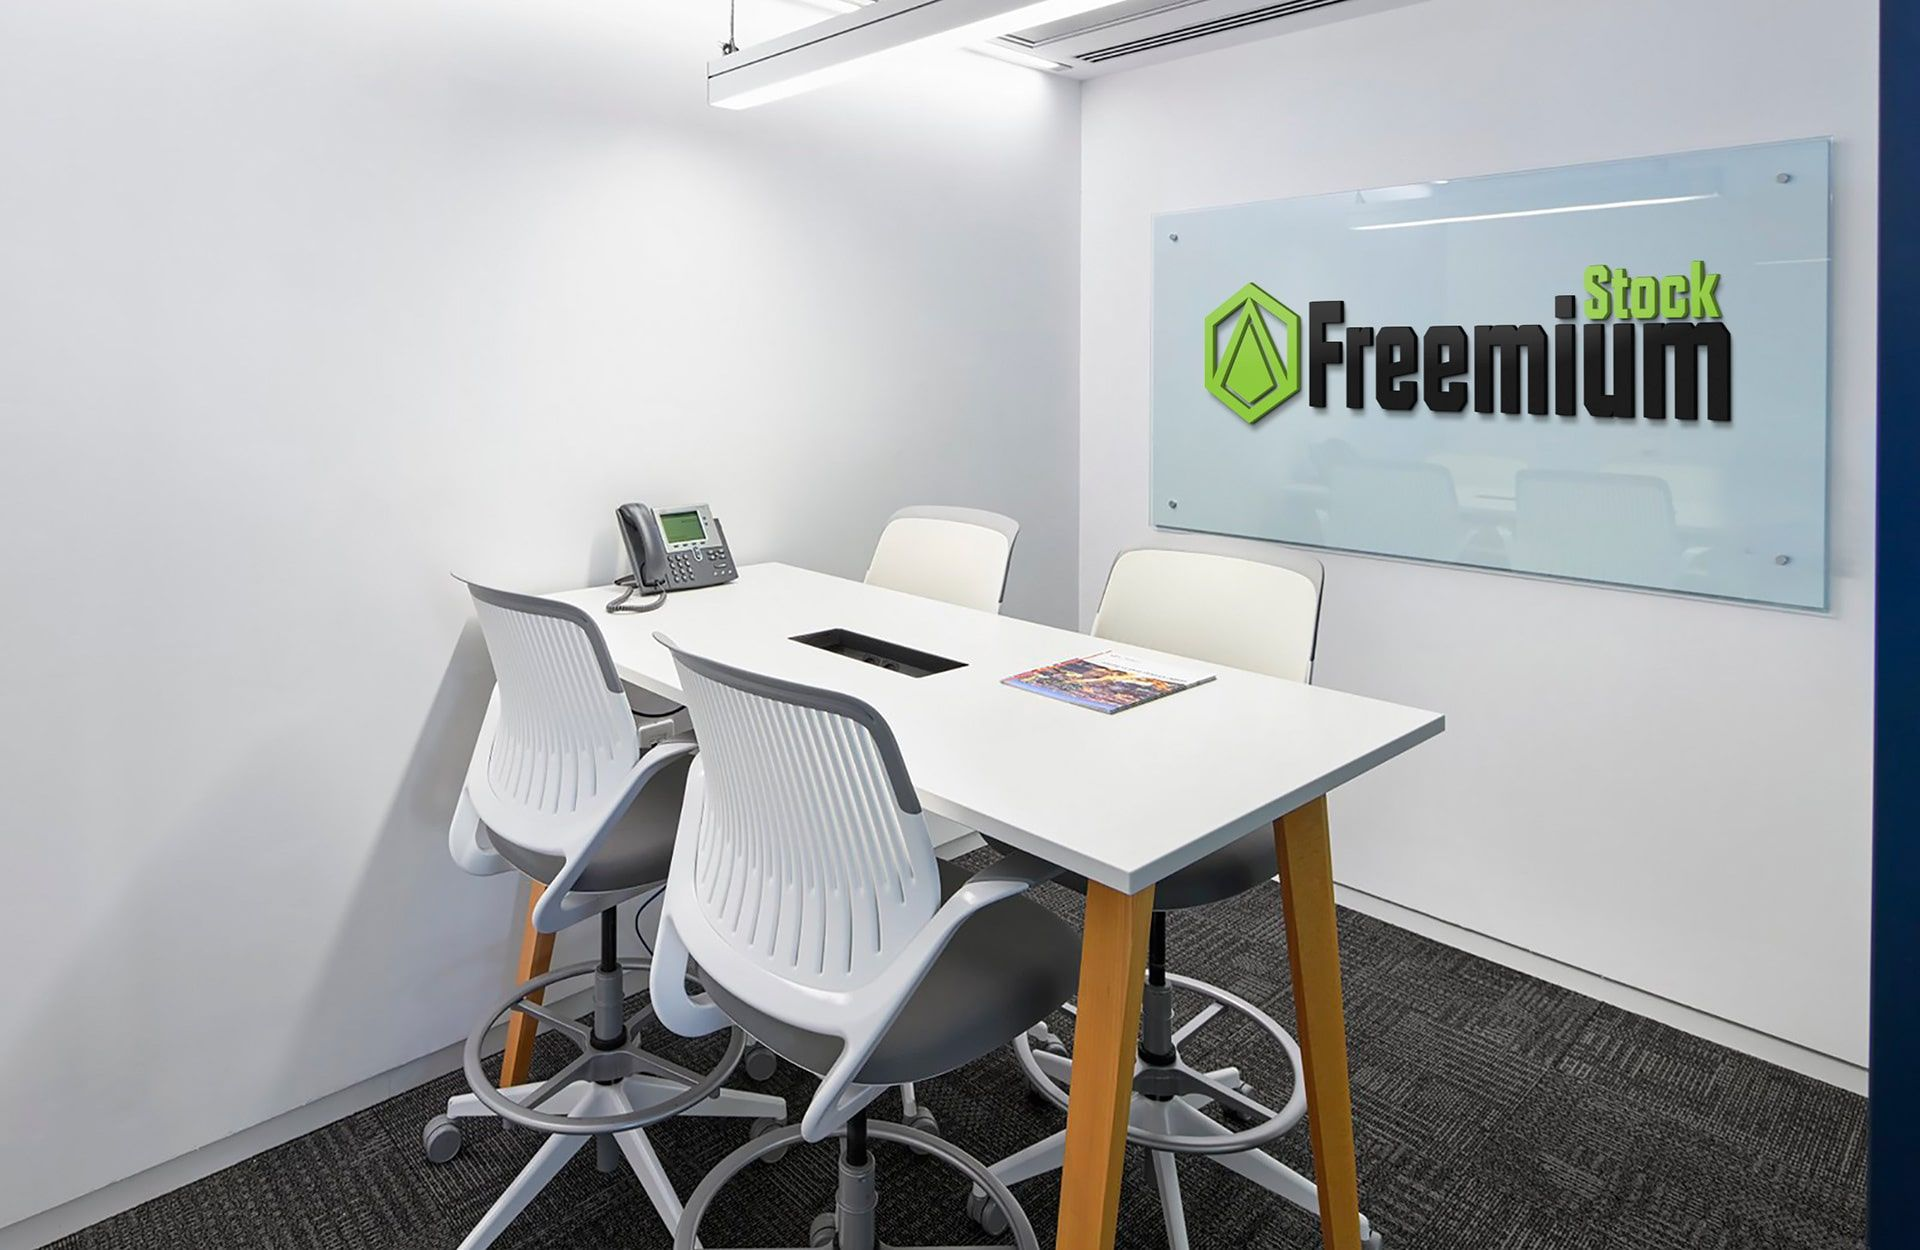 Free office interior mockup